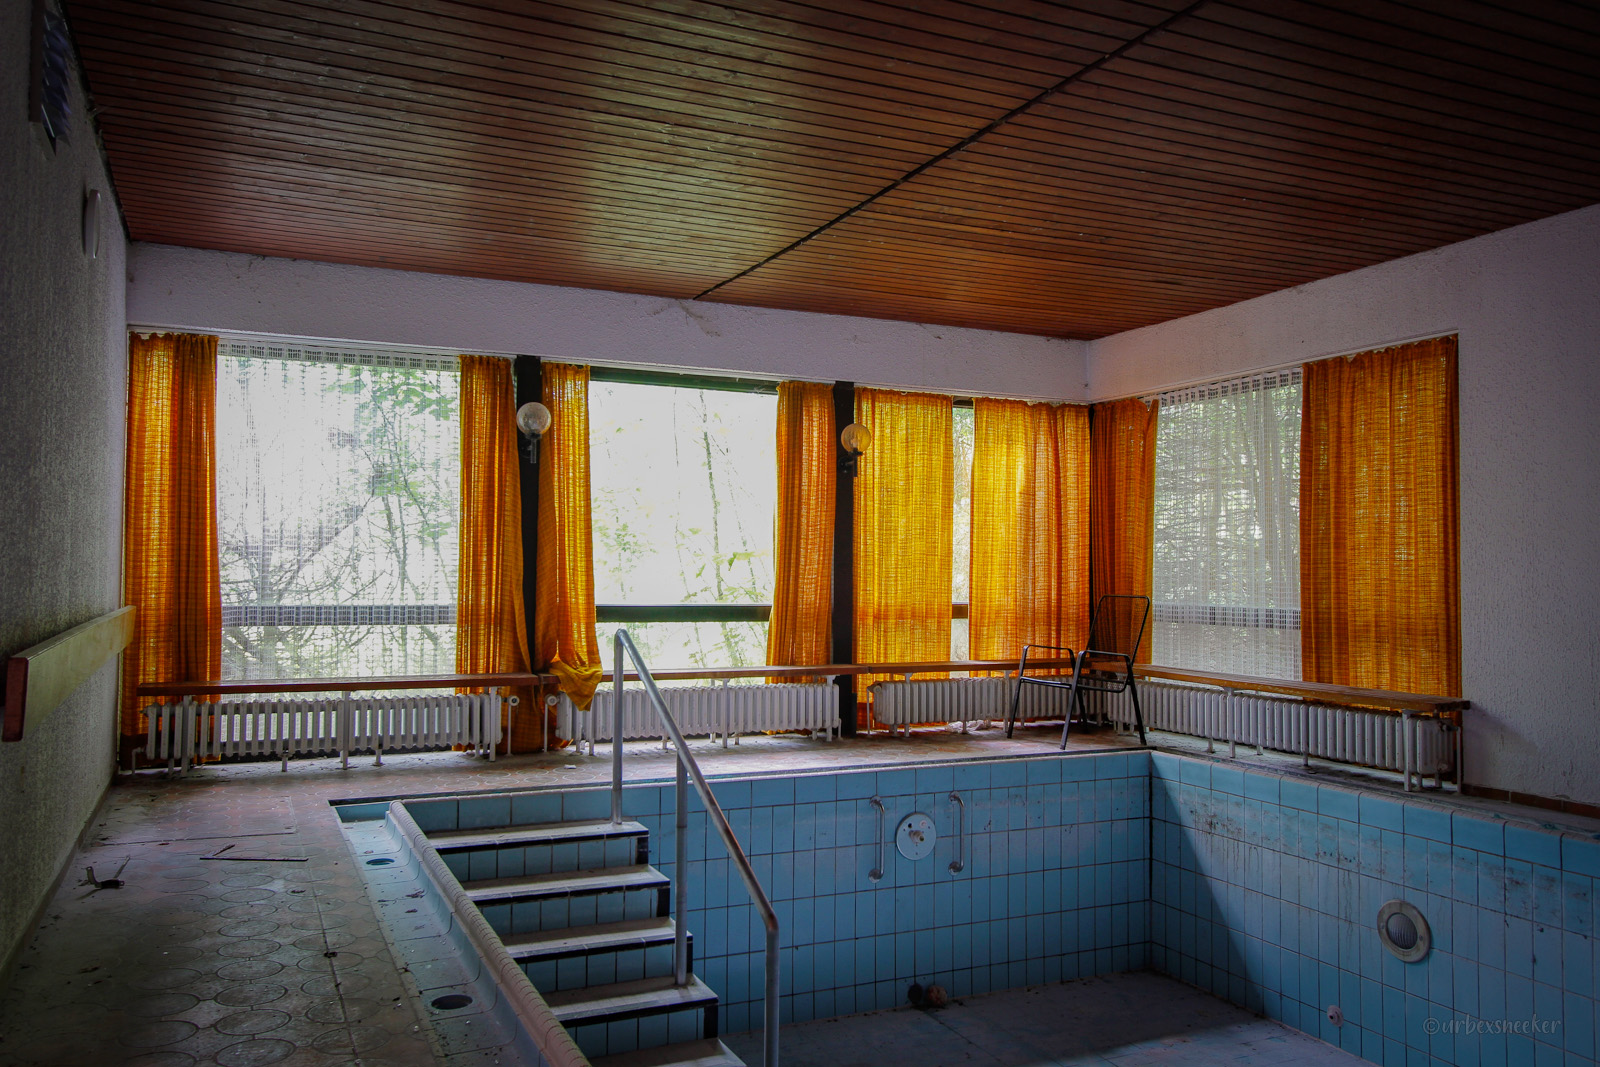 verlassenes Schwimmbad Hotel Teddy MG_5267